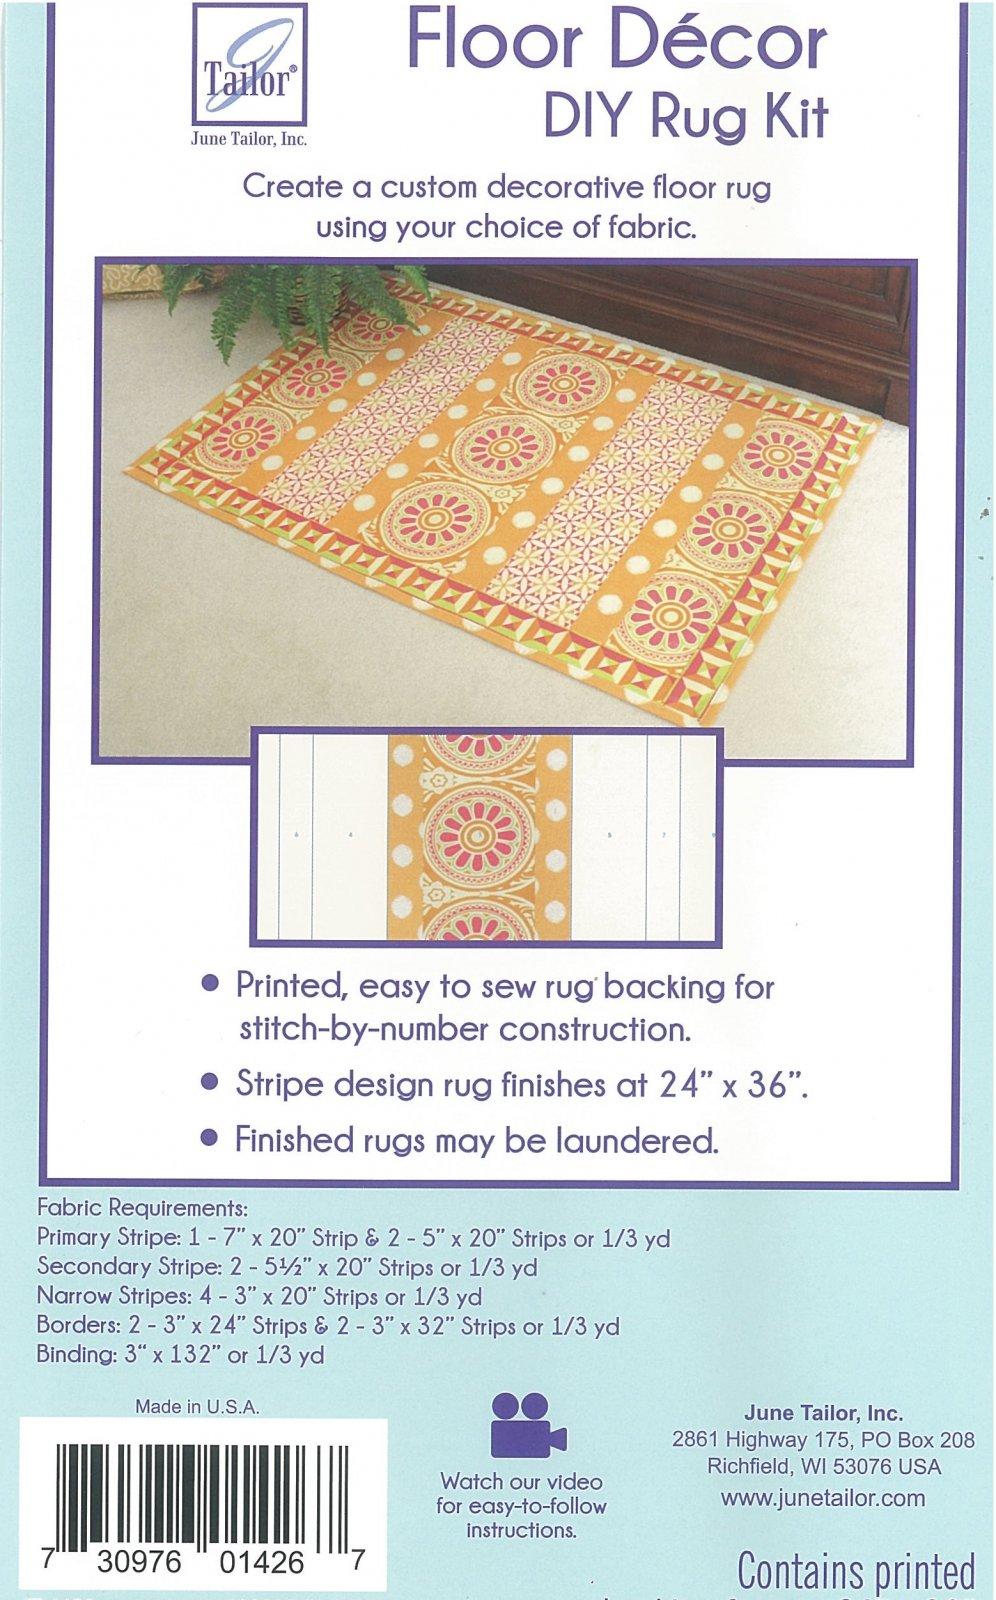 June Tailor - Floor Decor - DIY Rug Kit (Stripes)